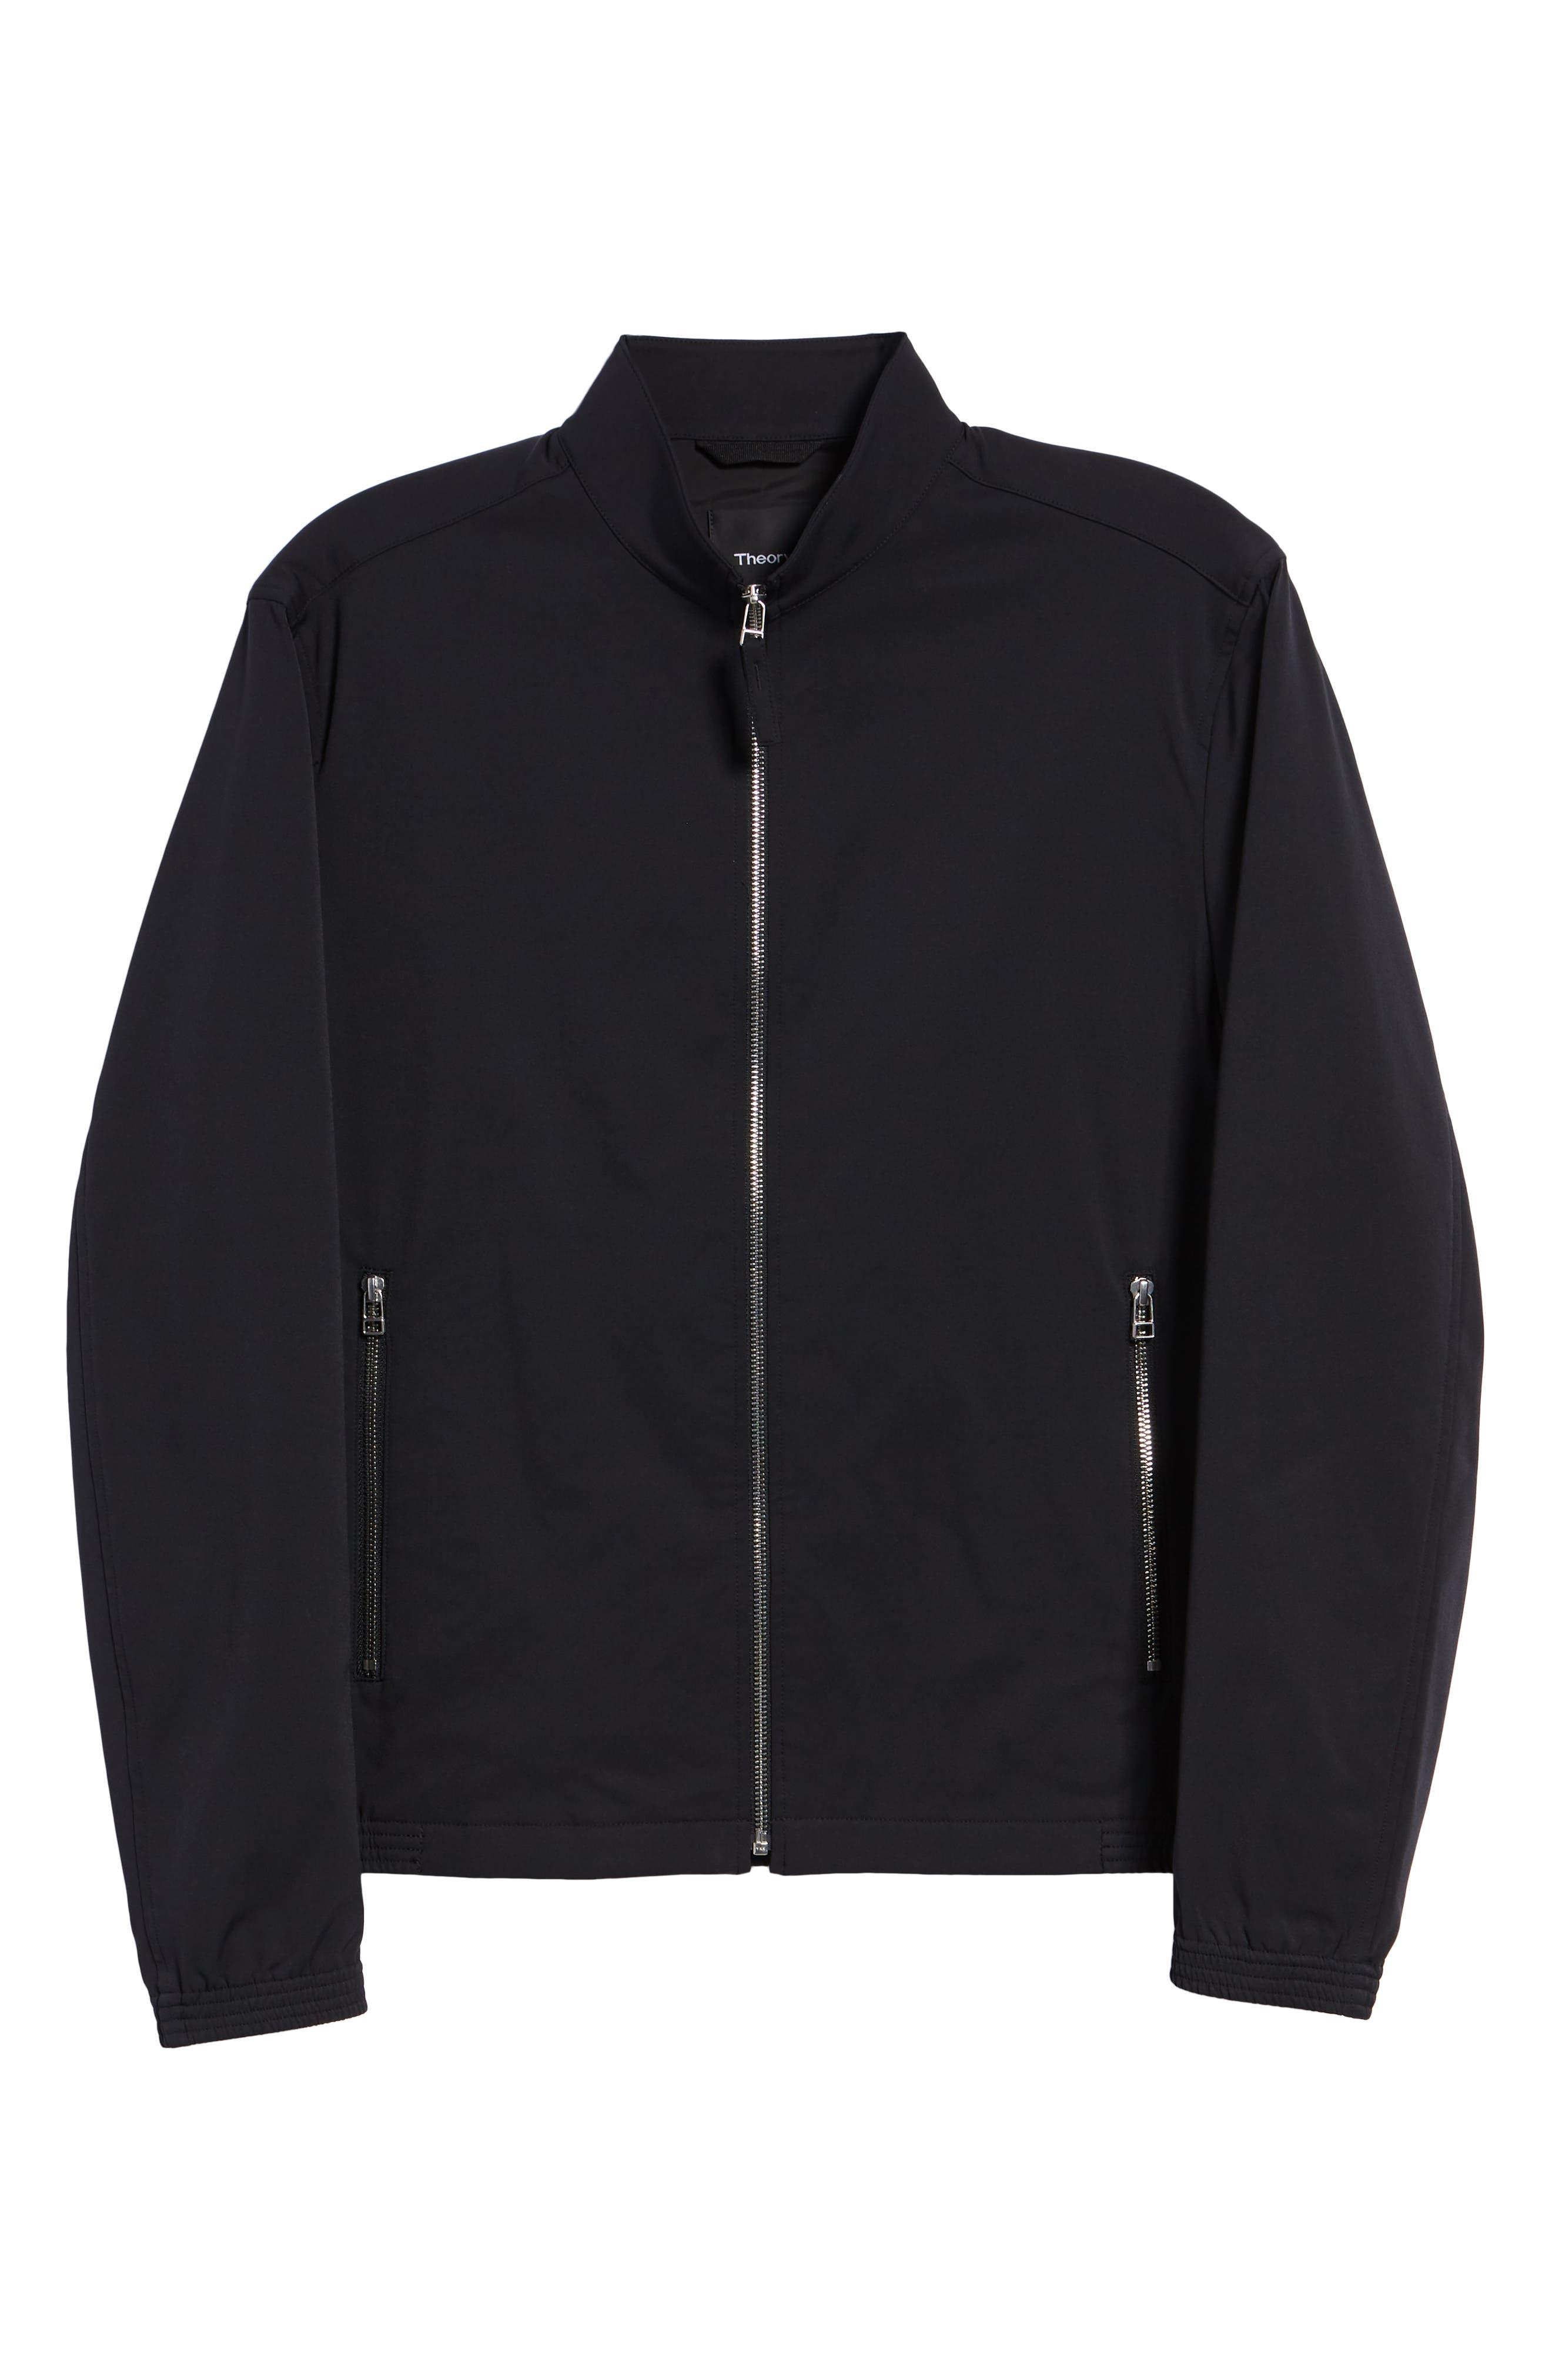 Tremont Neoteric Regular Fit Jacket,                             Alternate thumbnail 5, color,                             BLACK